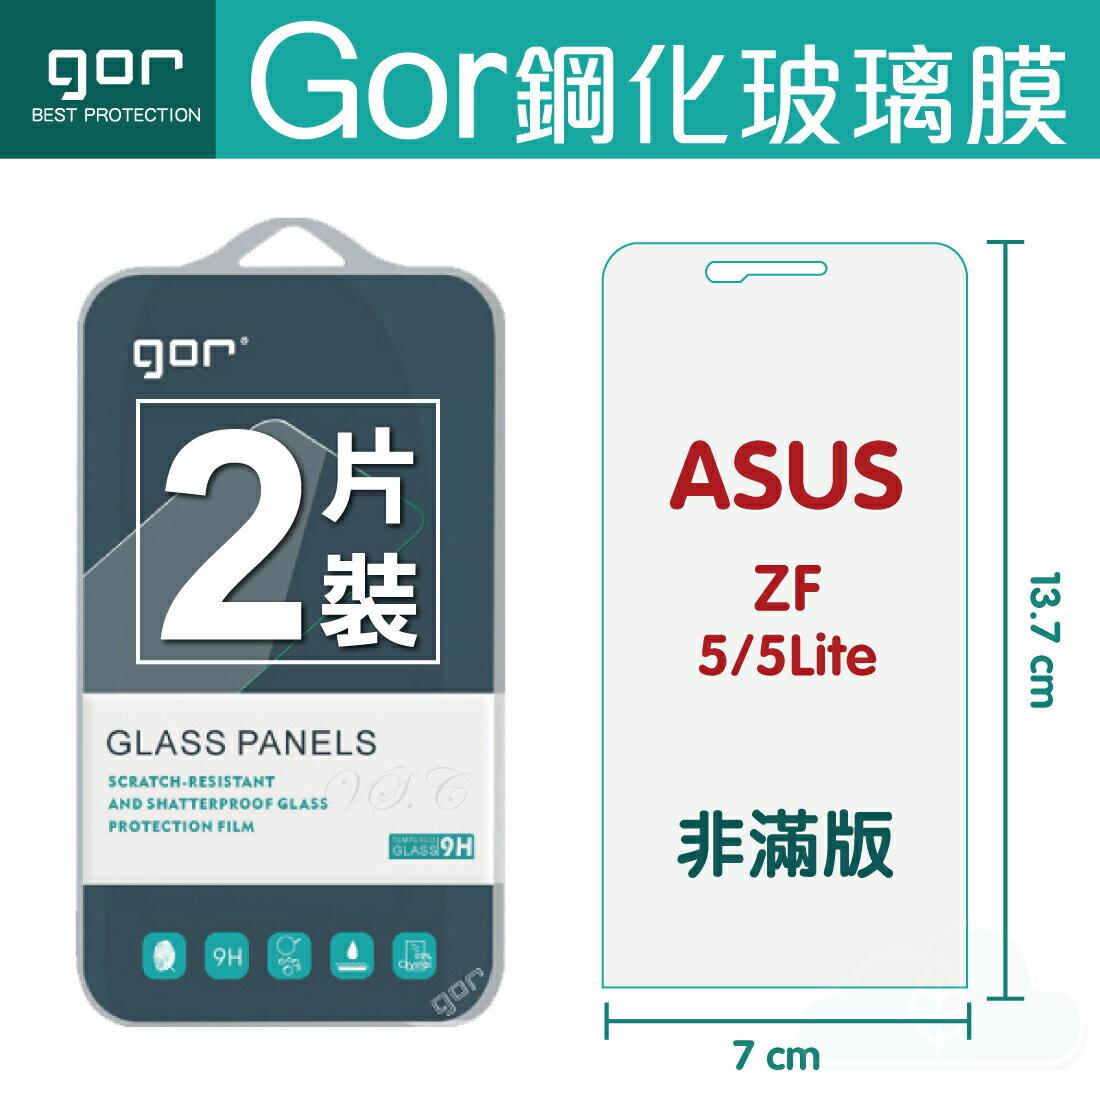 GOR 9H 華碩 ZenFone 5/5 Lite 鋼化 玻璃 保護貼 全透明非滿版 兩片裝【全館滿299免運費】